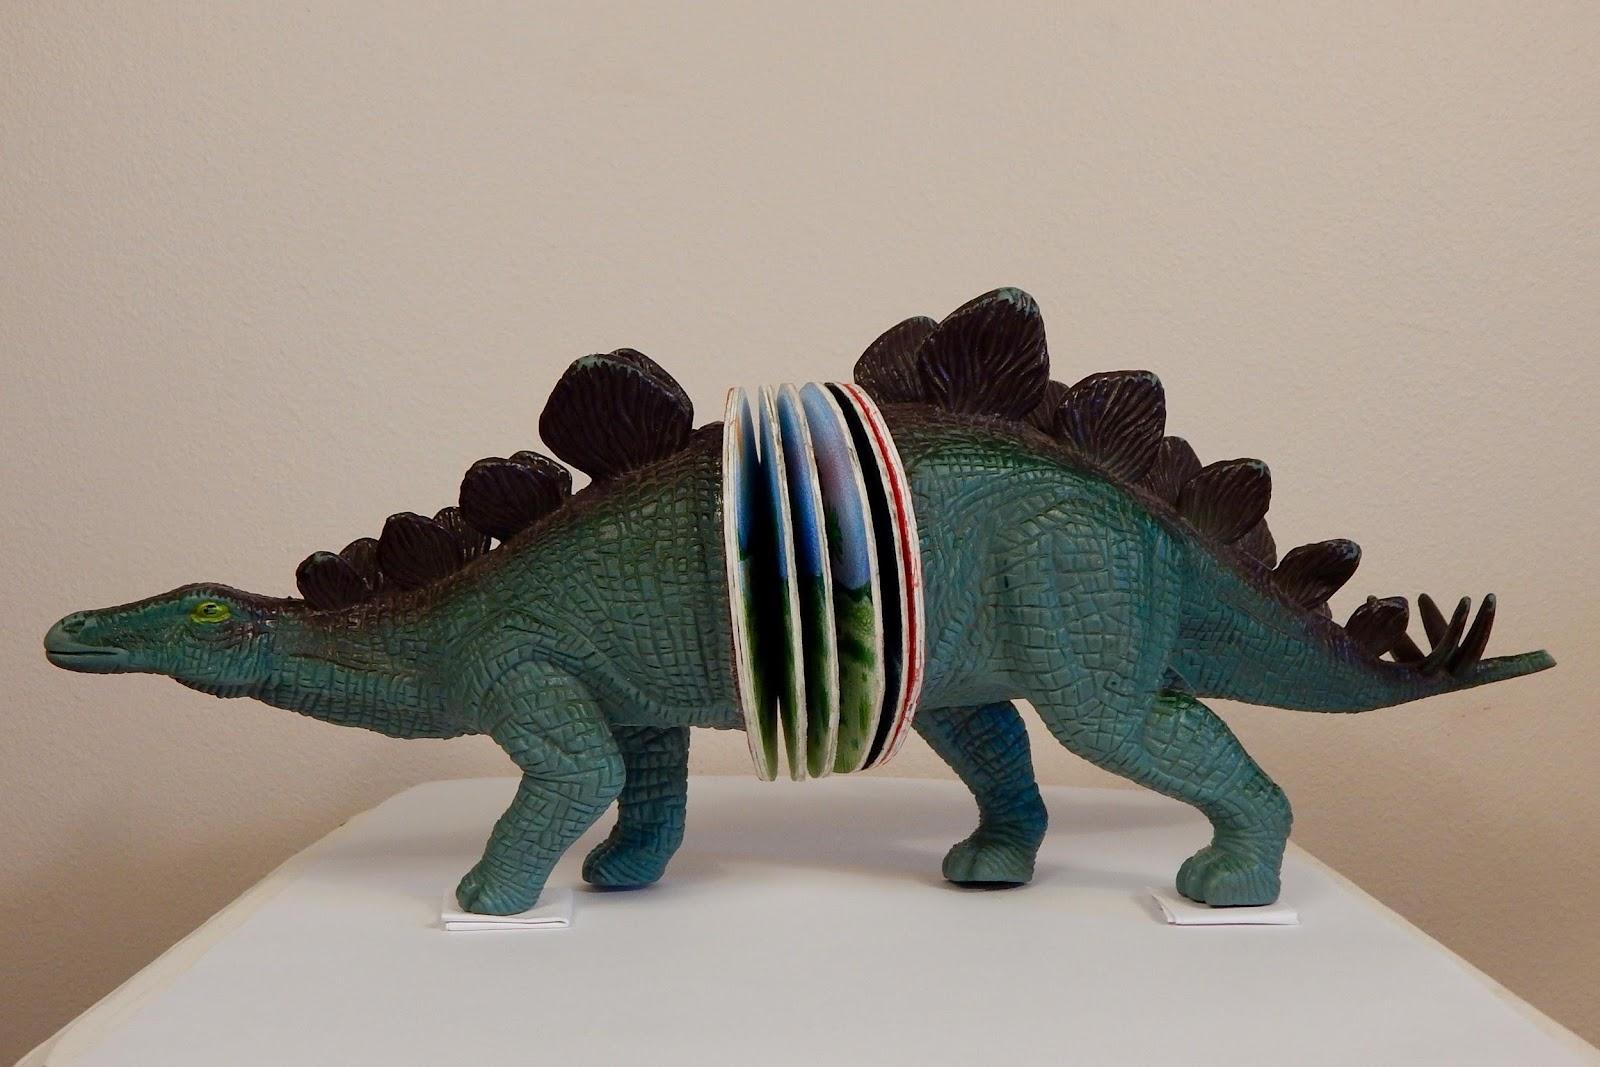 "4"" x 17"" Mixed Media: repurposed children's book, toy stegosaurus, paint, paper, colored pencil."